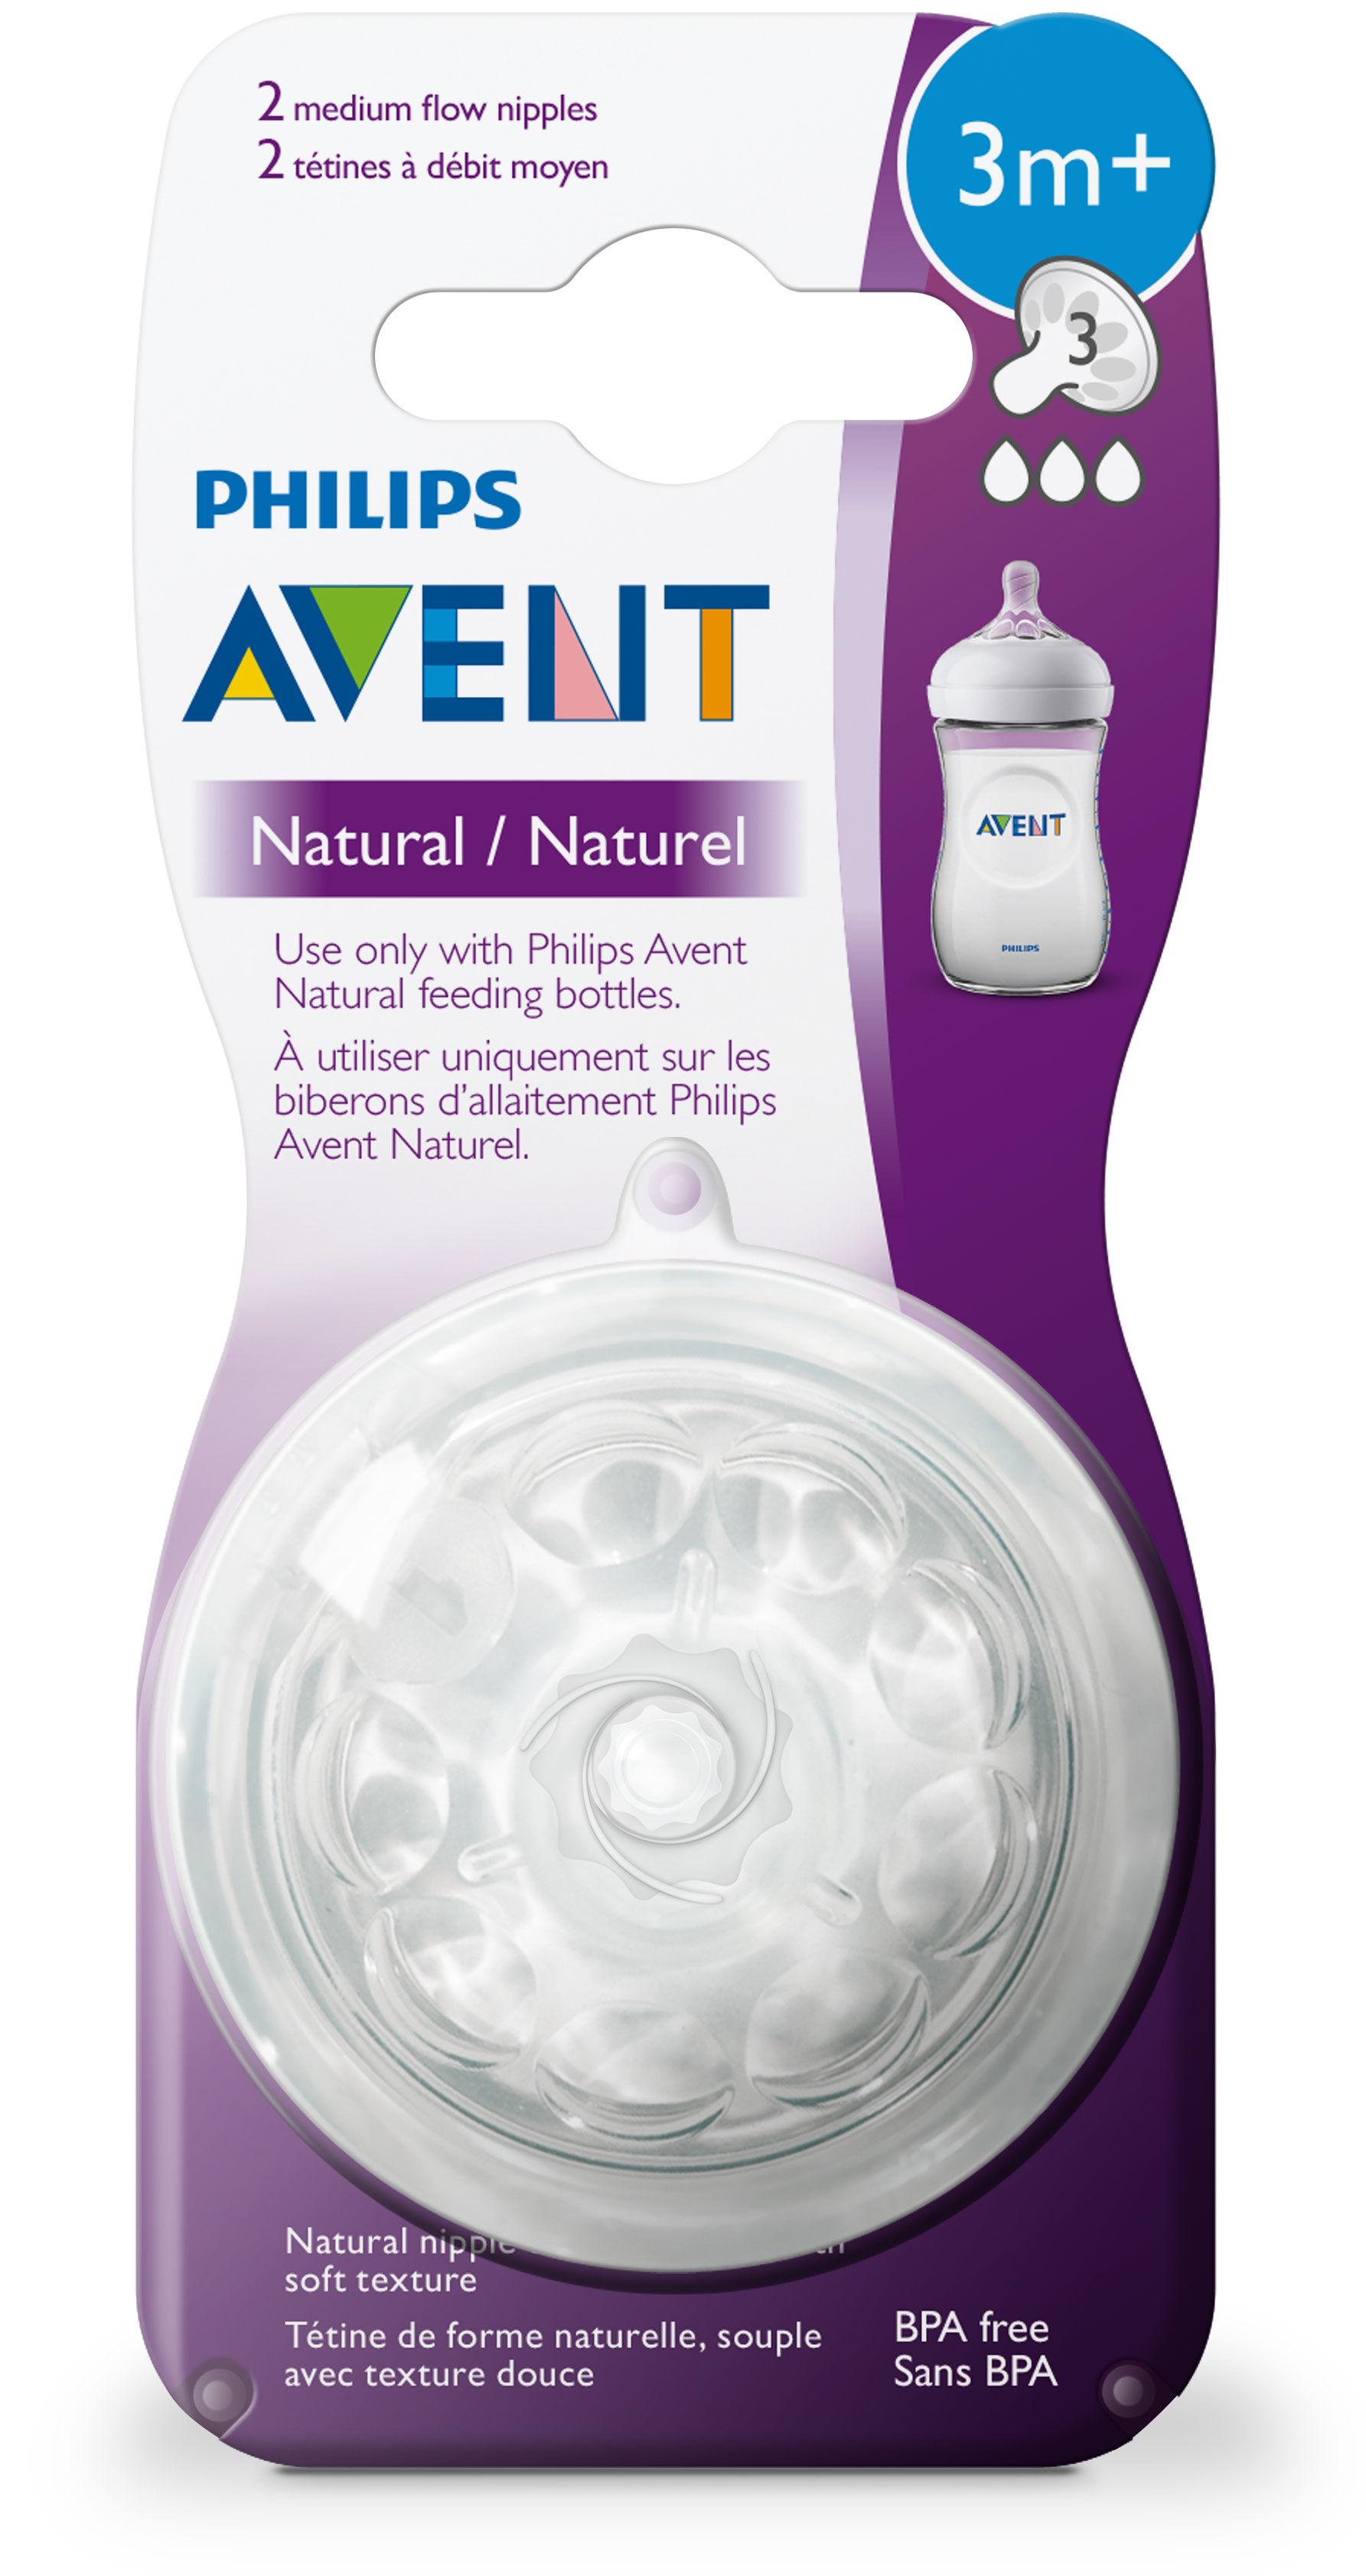 Baby Newborn Bottle Teat Vent Fast Slow Flow Philips Avent Natural Classic Philips Avent Natural Teat Medium Flow 2Pk